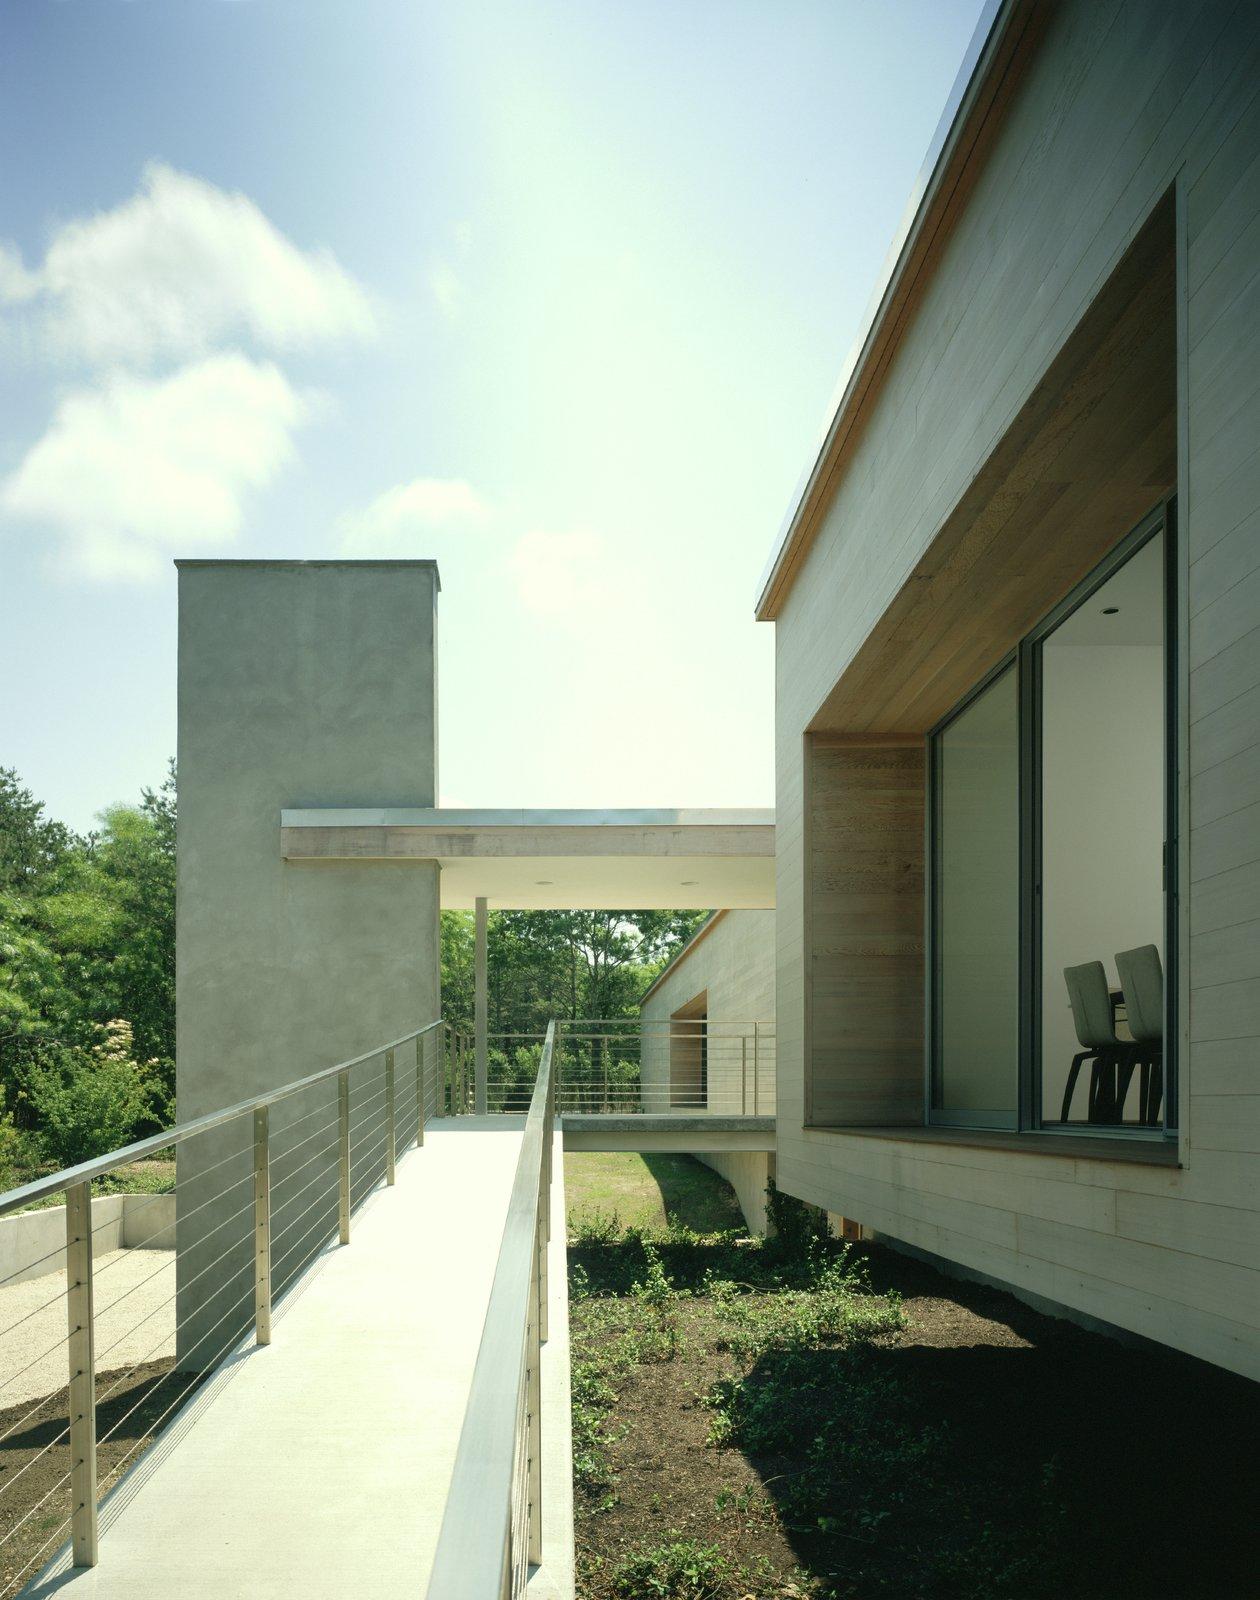 Tagged: Outdoor, Decking Patio, Porch, Deck, and Walkways.  Sagaponac House by Hariri & Hariri Architecture